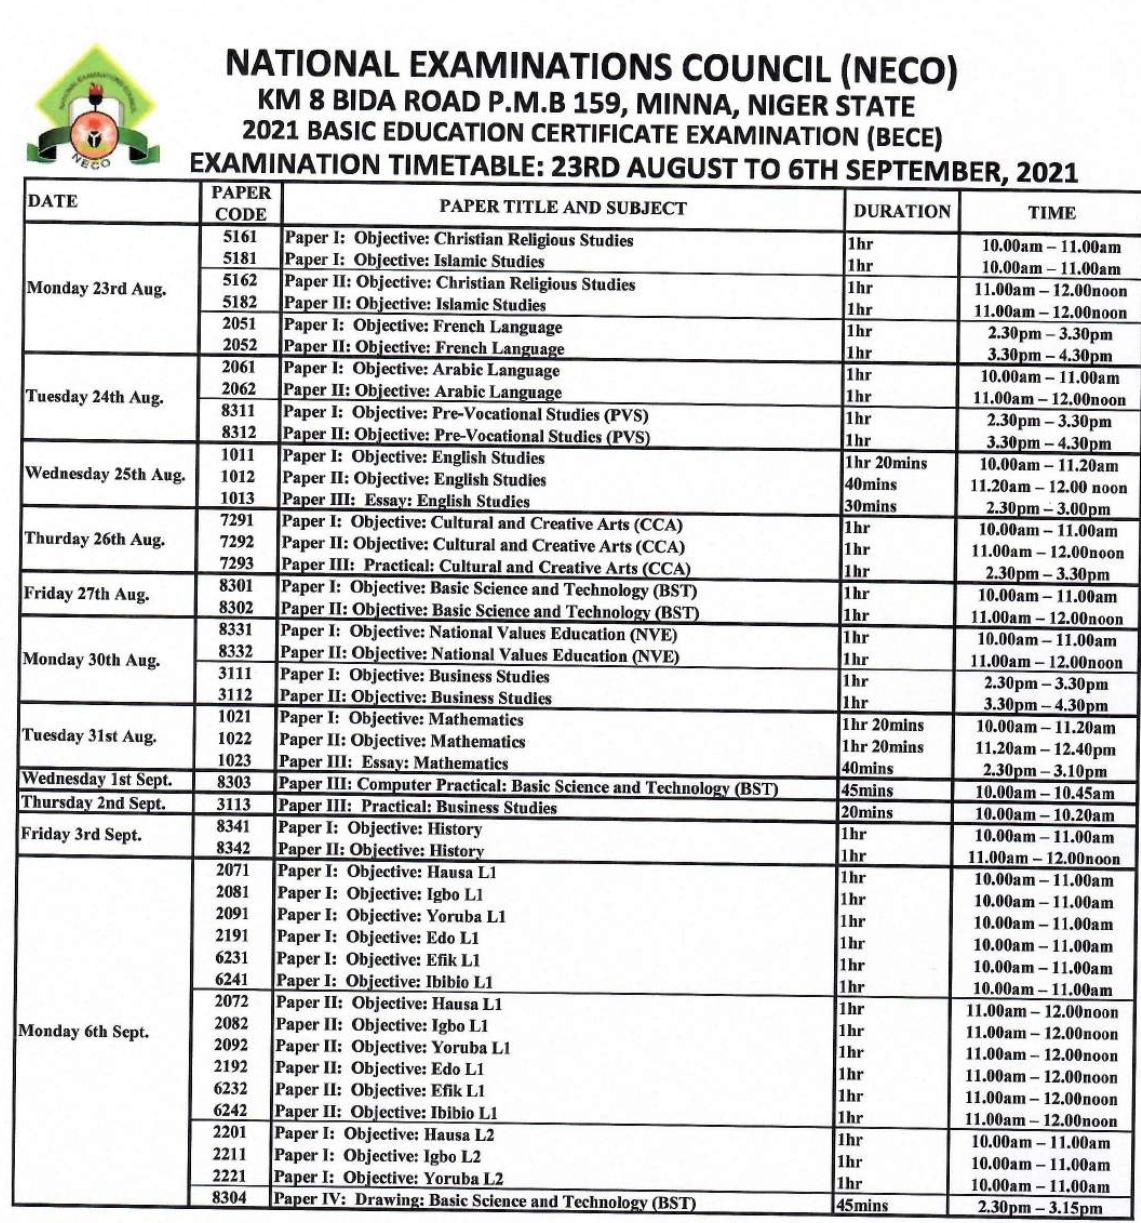 NECO BECE Timetable [23rd Aug - 6th Sept 2021]   Unity Schools